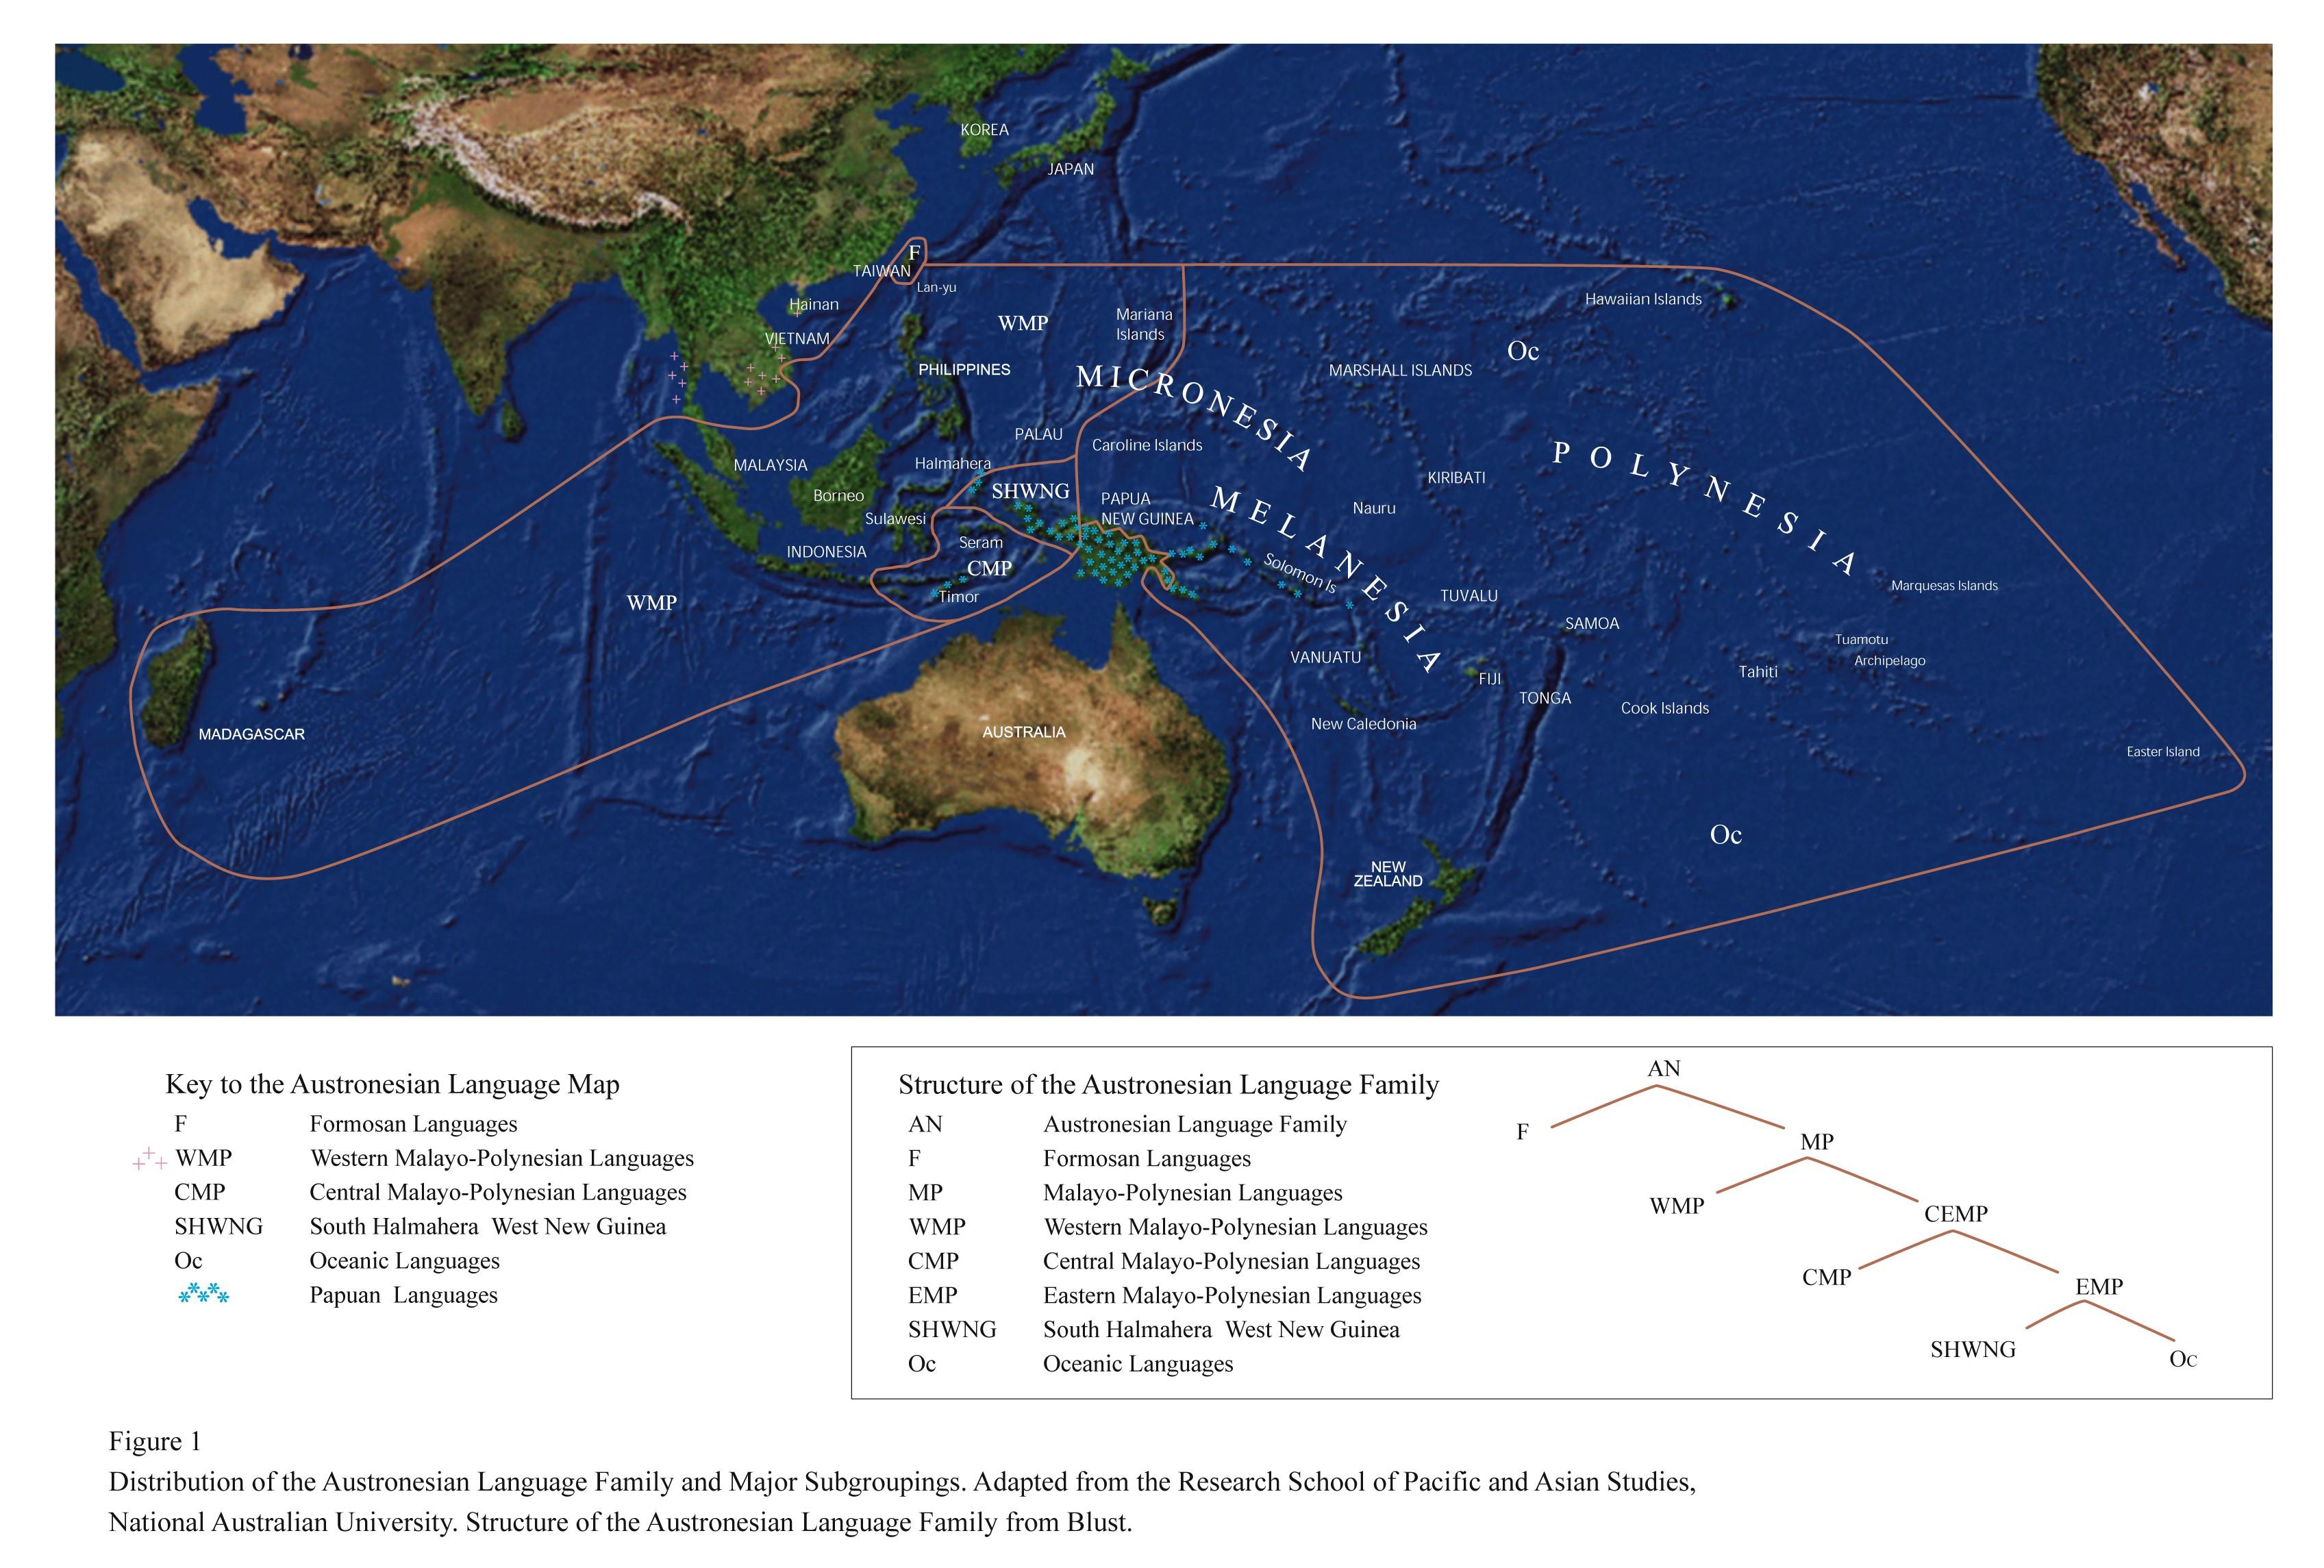 Austronesian language map